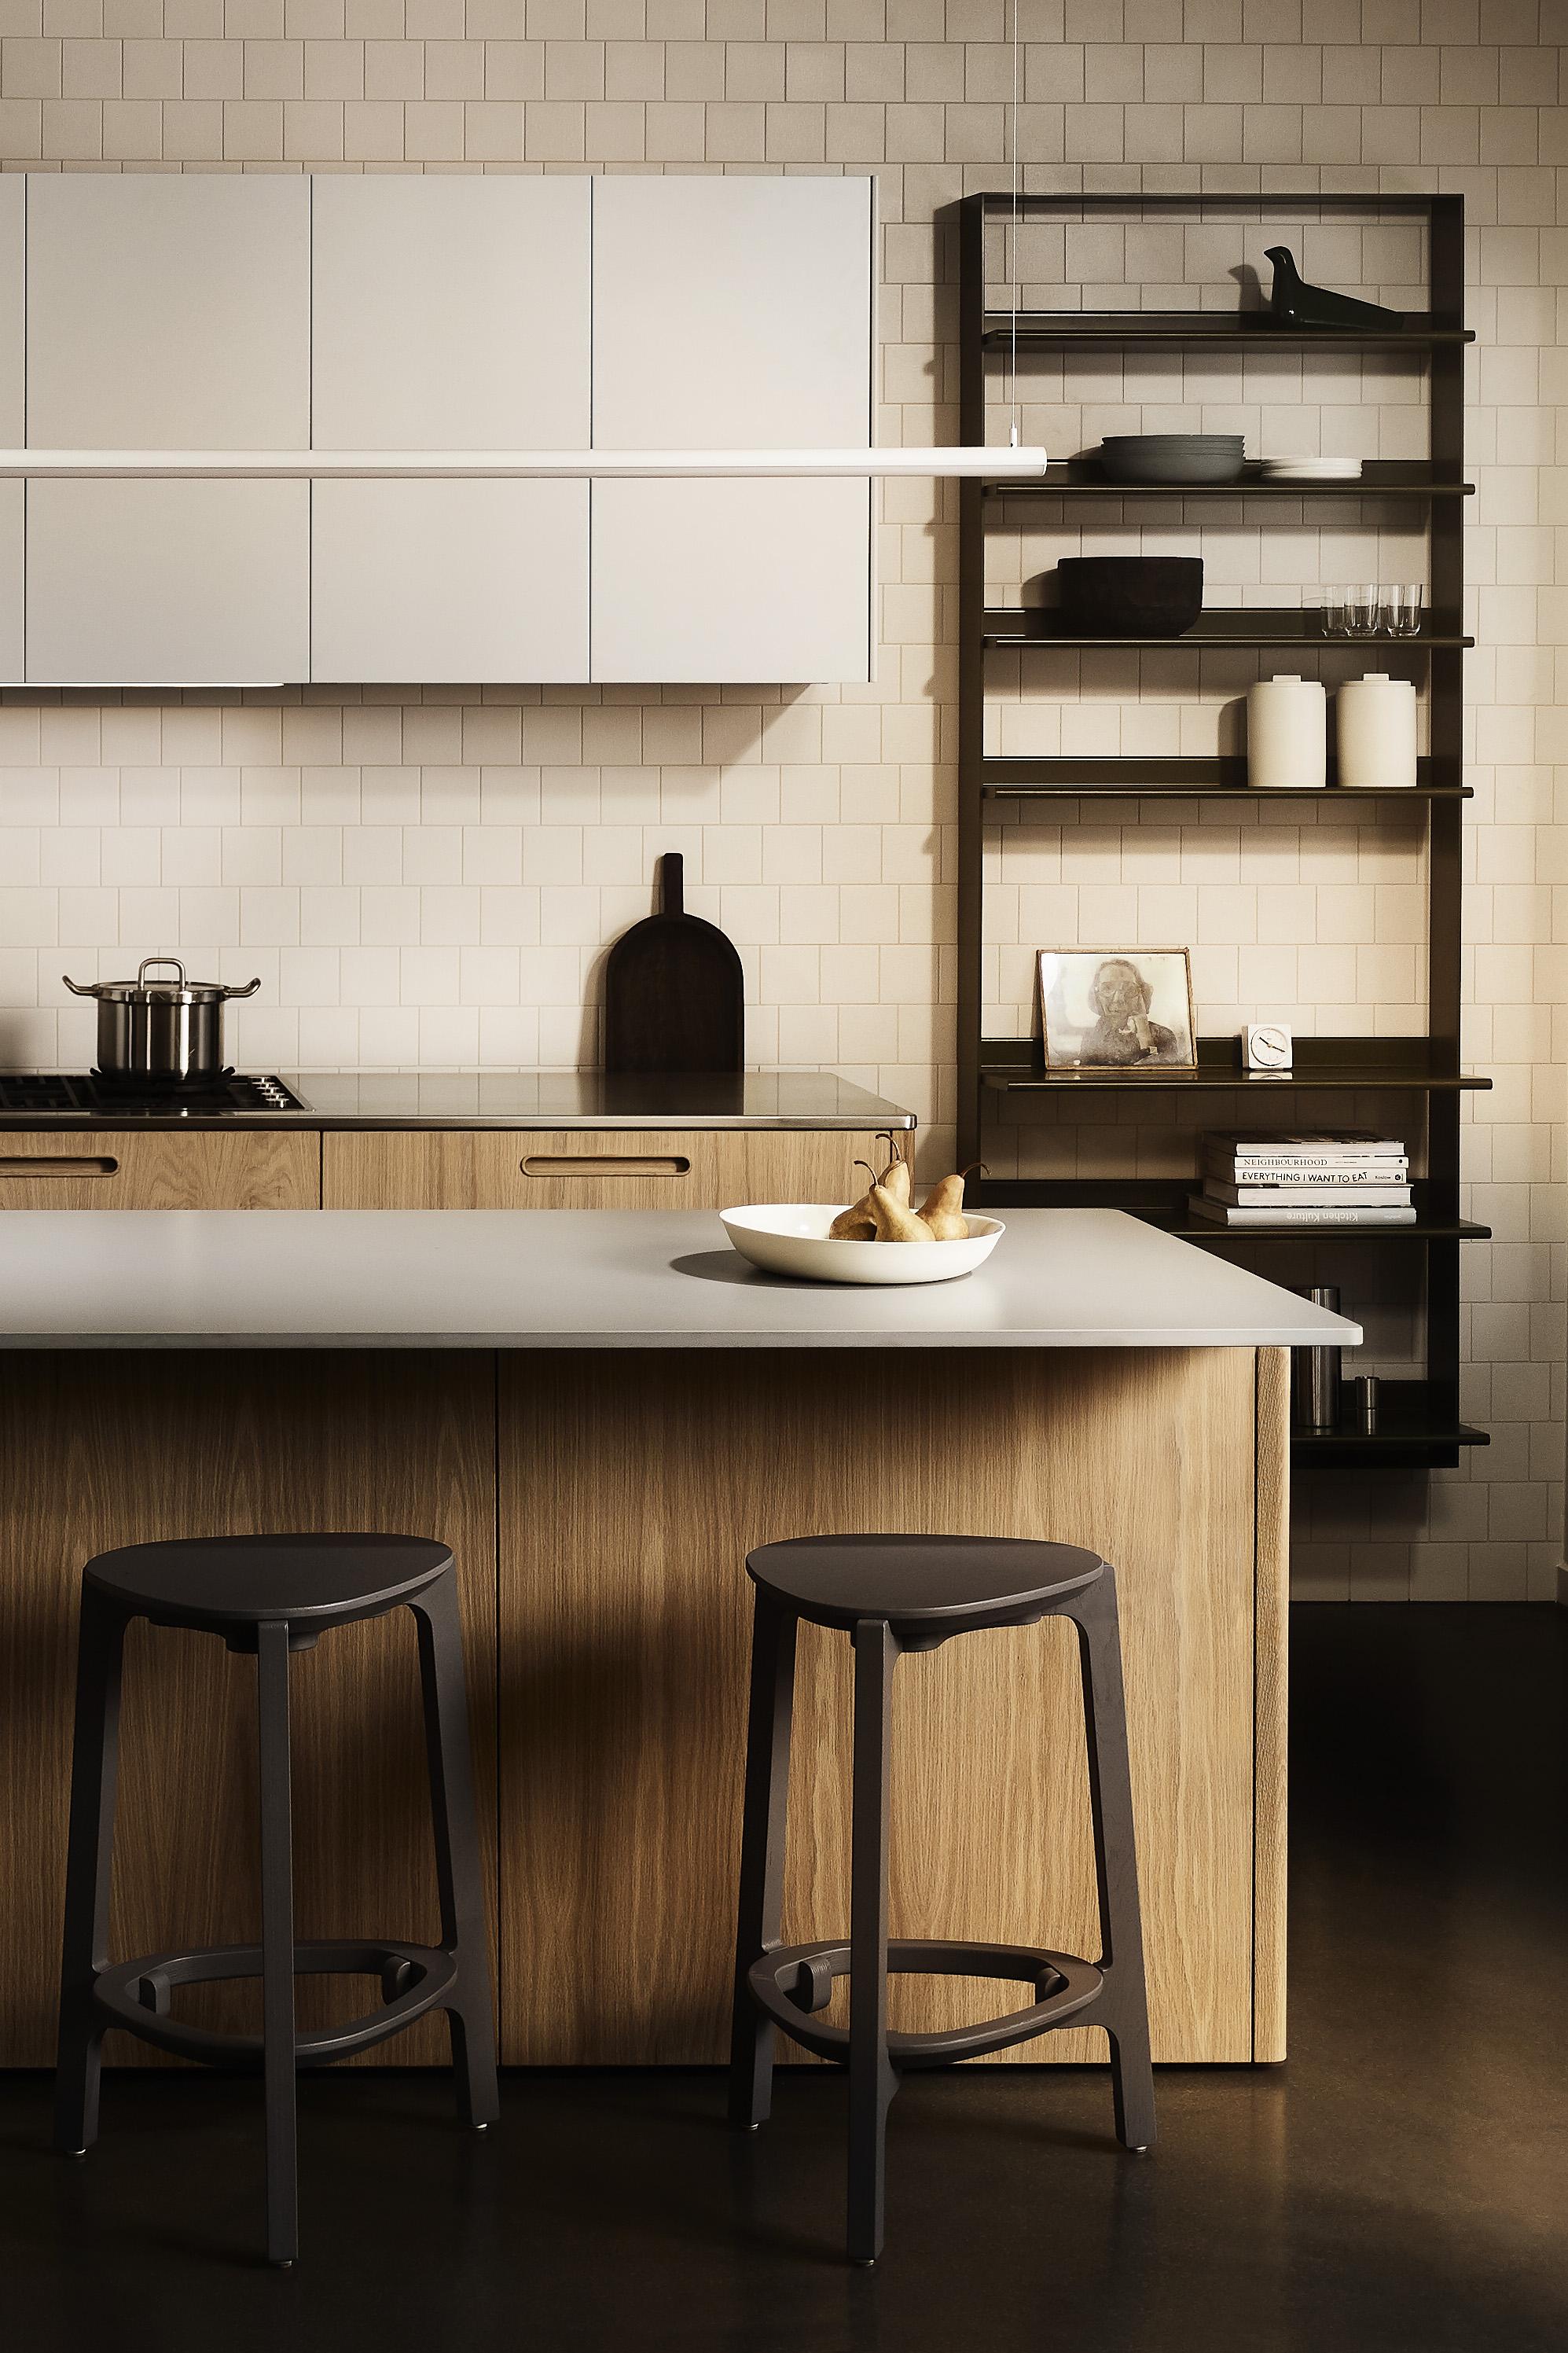 Tableau Cantilever DesignOffice Kitchen System Australia (12).JPG